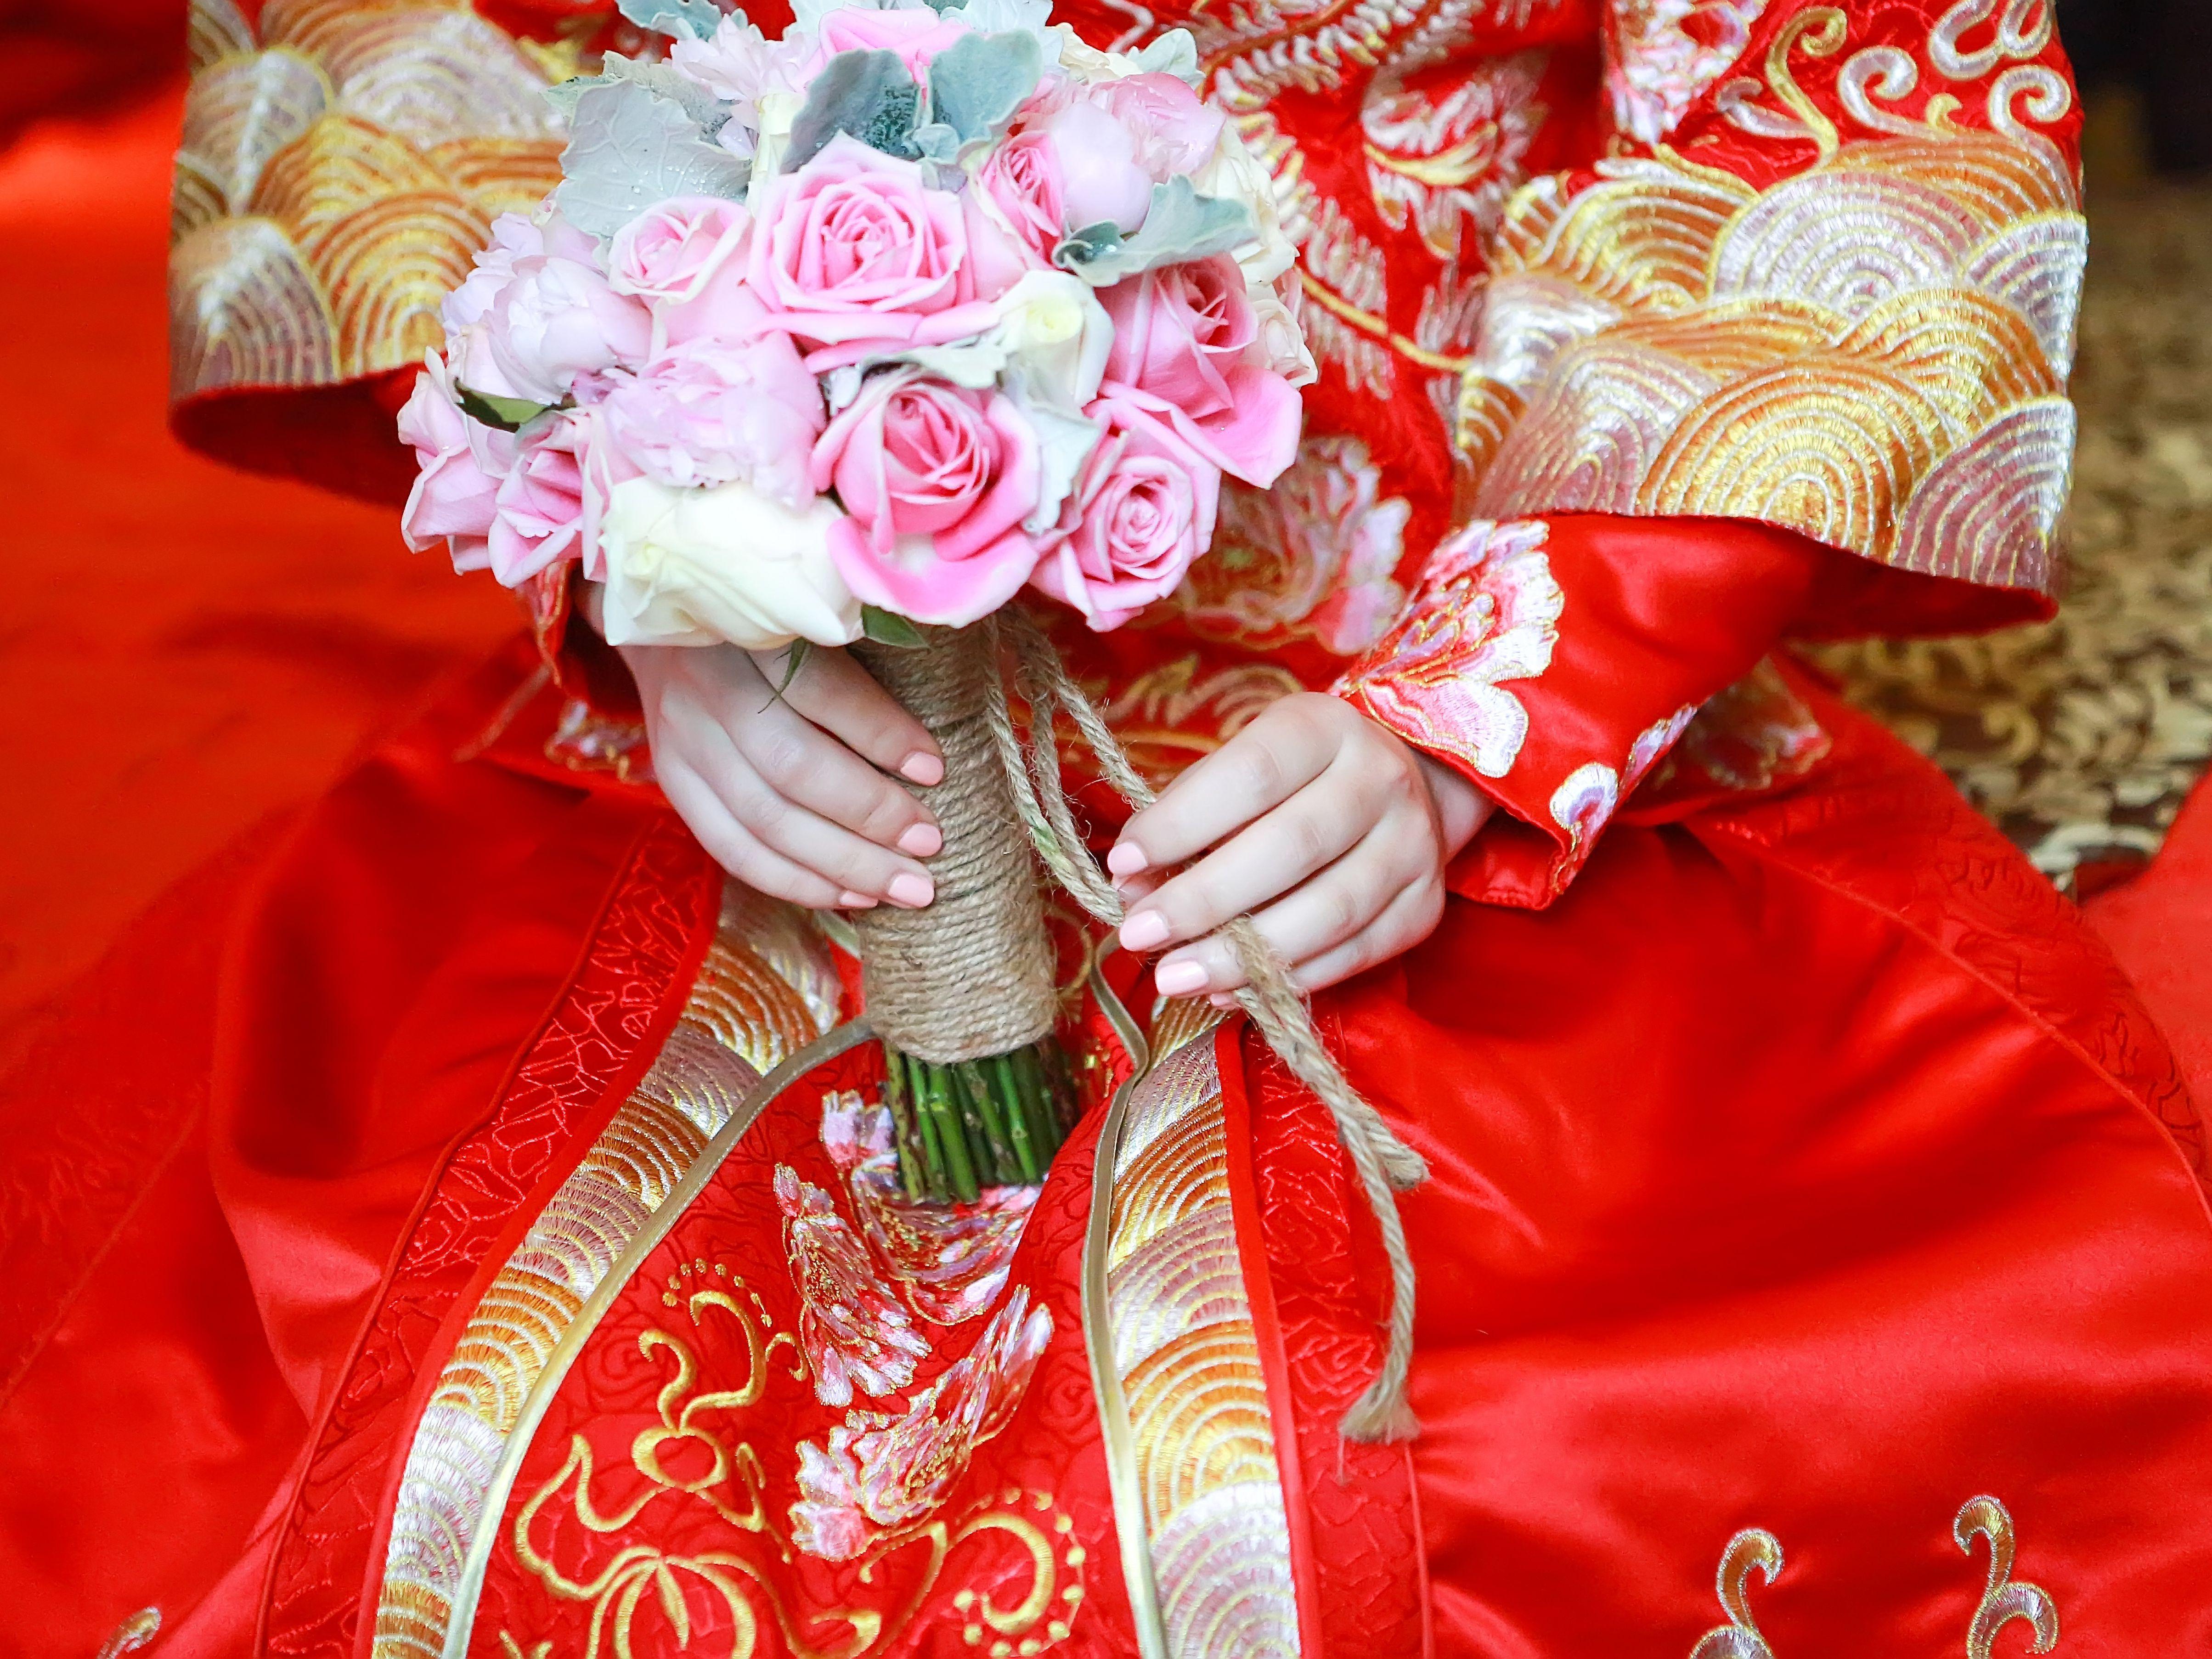 flower decoration for wedding reception.htm all about chinese wedding flowers  all about chinese wedding flowers